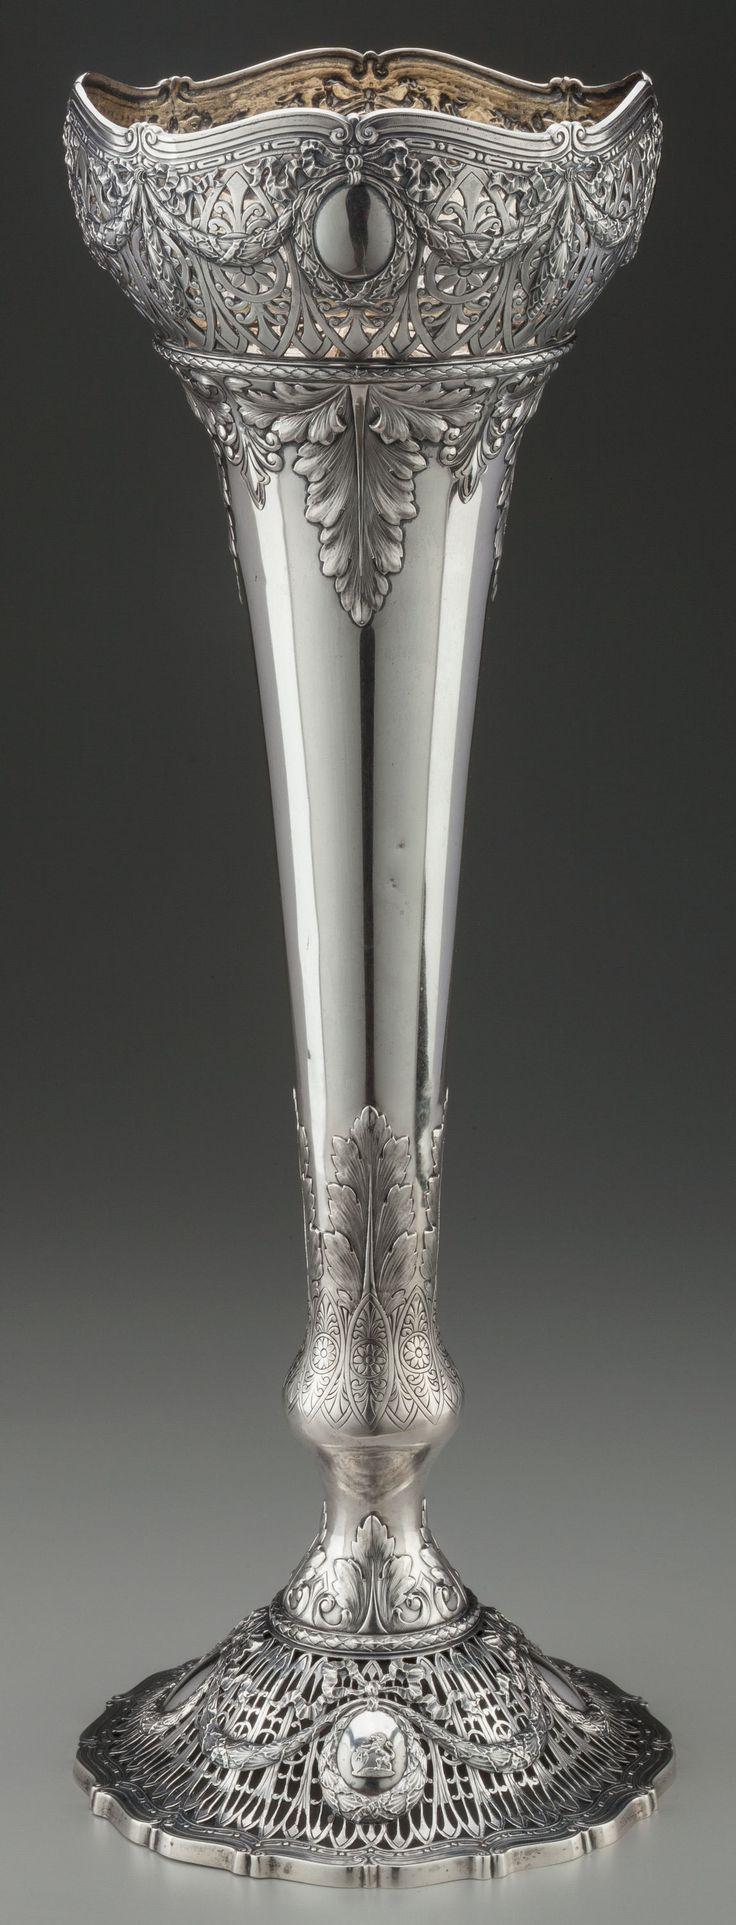 Shreve & Co sterling silver ornate vase - San Francisco, c1890 (Heritage Auctions)